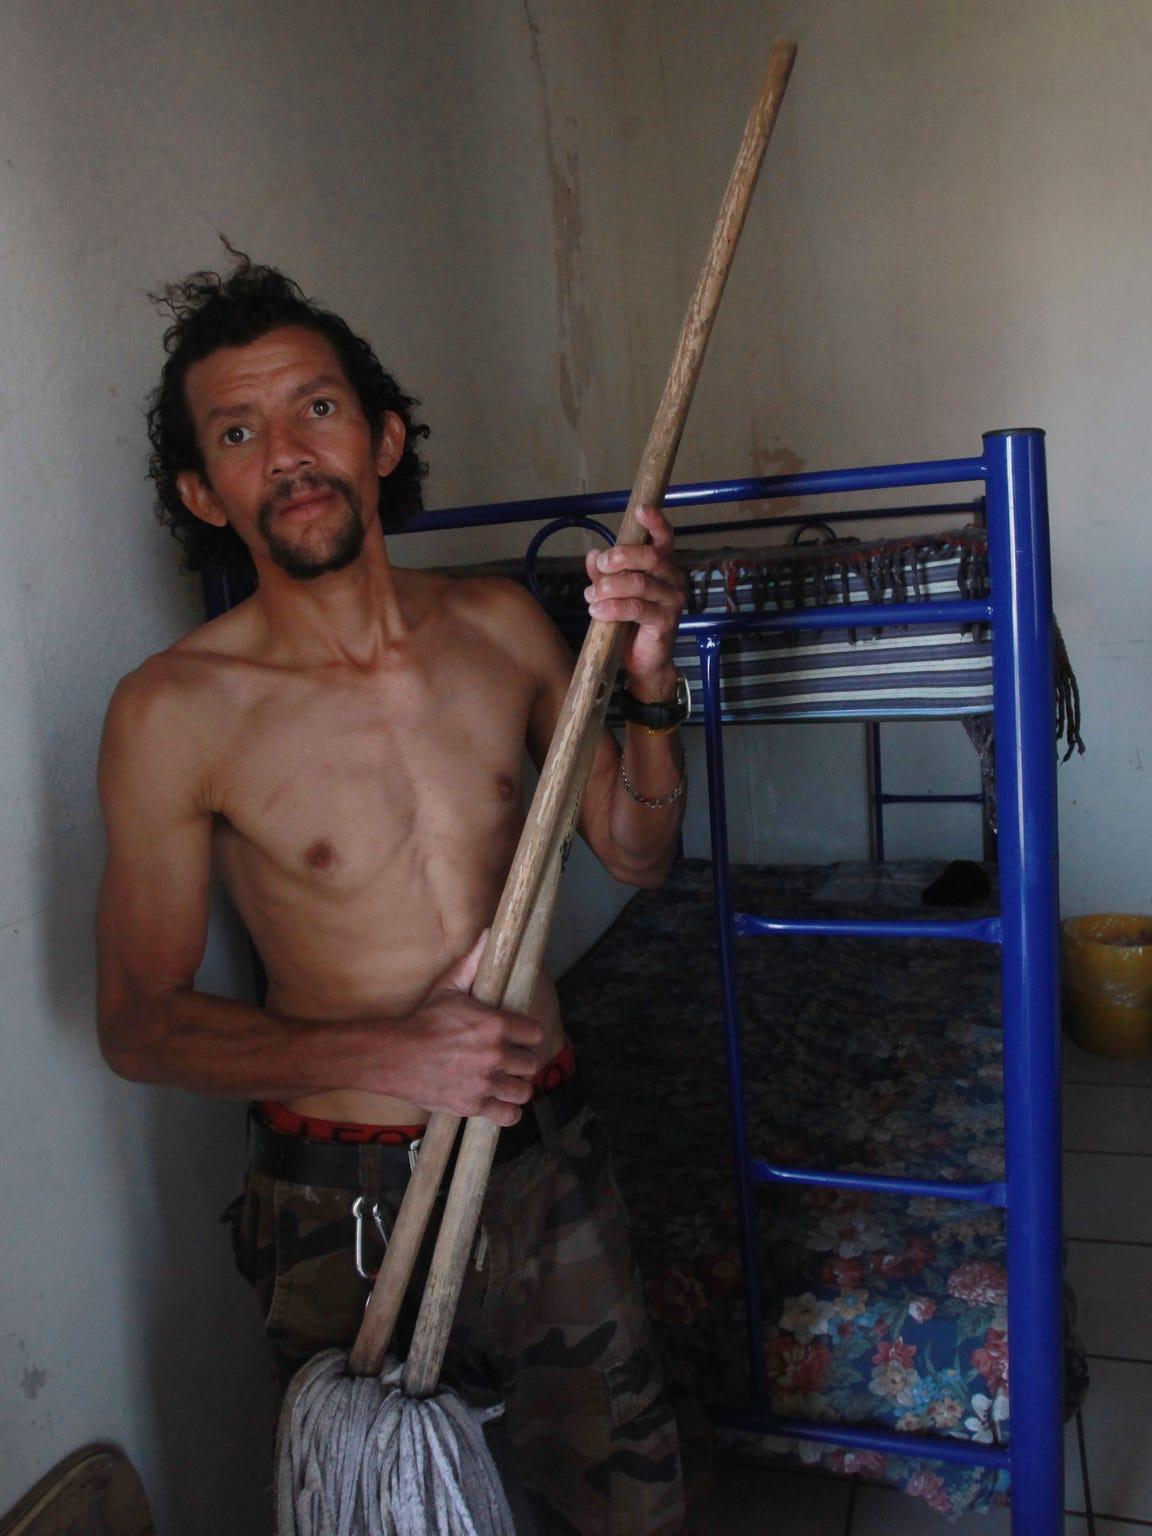 Jose Humberto Montalvan, a Honduran migrant who abandoned